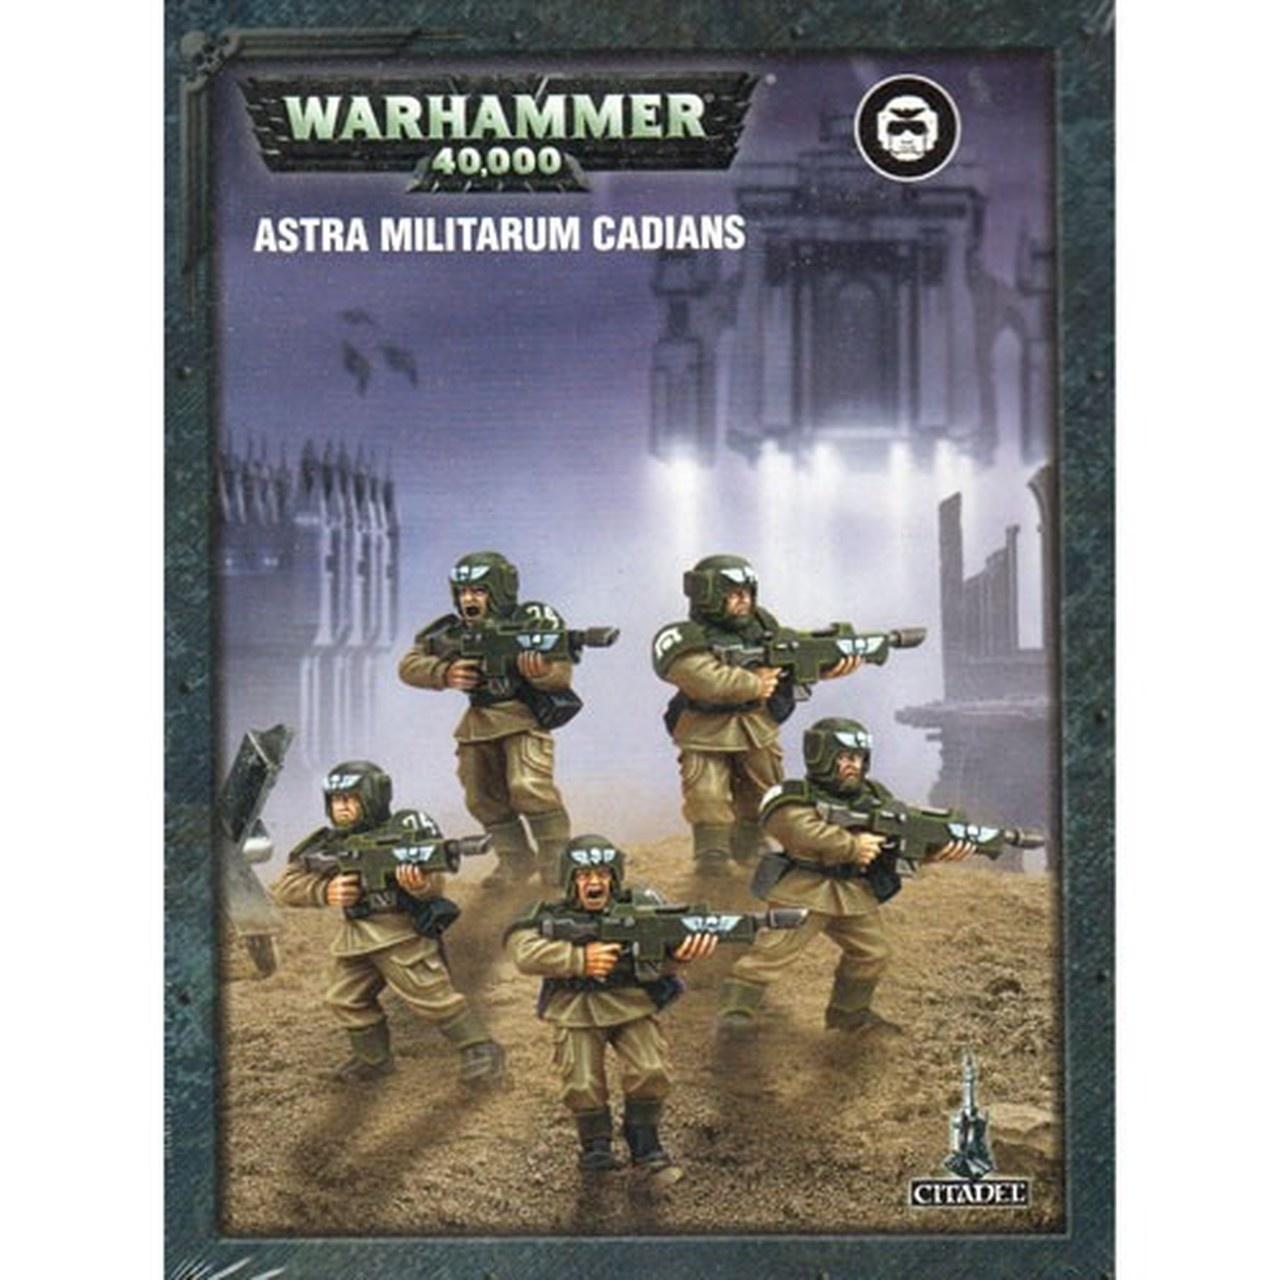 Games-Workshop Easy To Build Astra Militarum Cadians